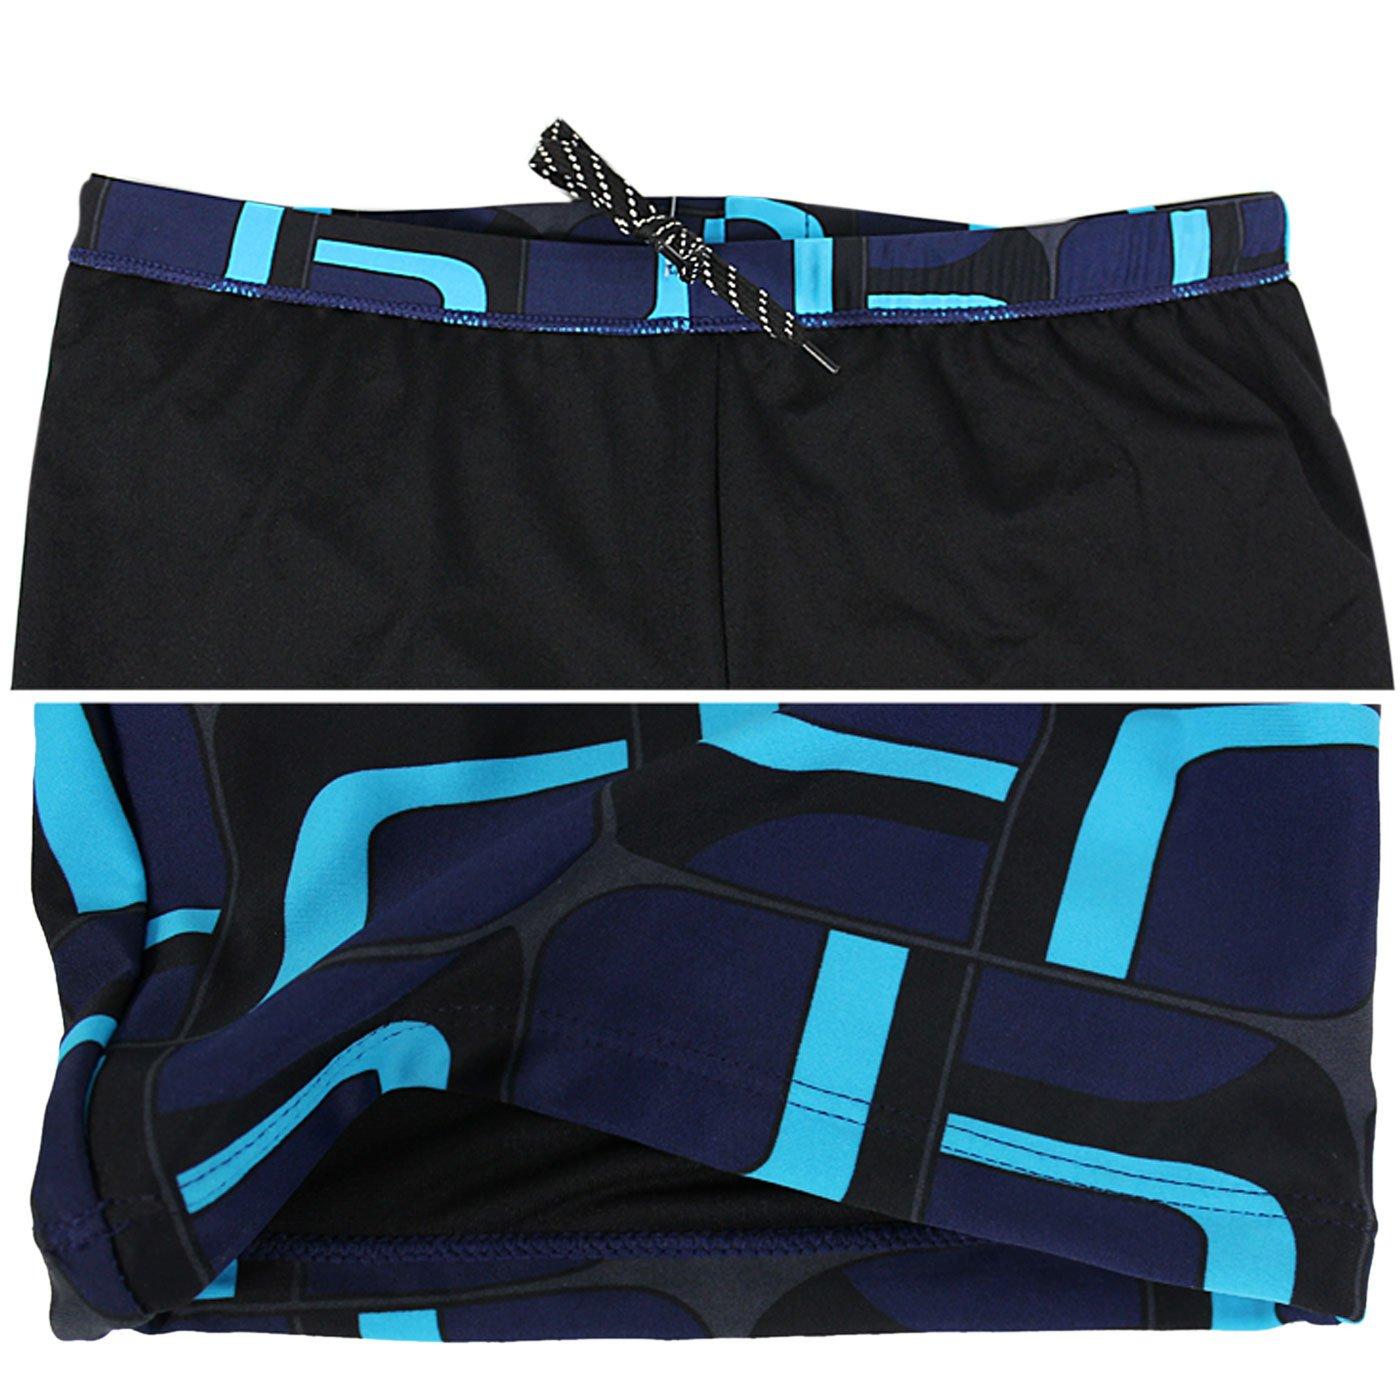 FEOYA Mens Durable Jammer Swimwear With Pockets